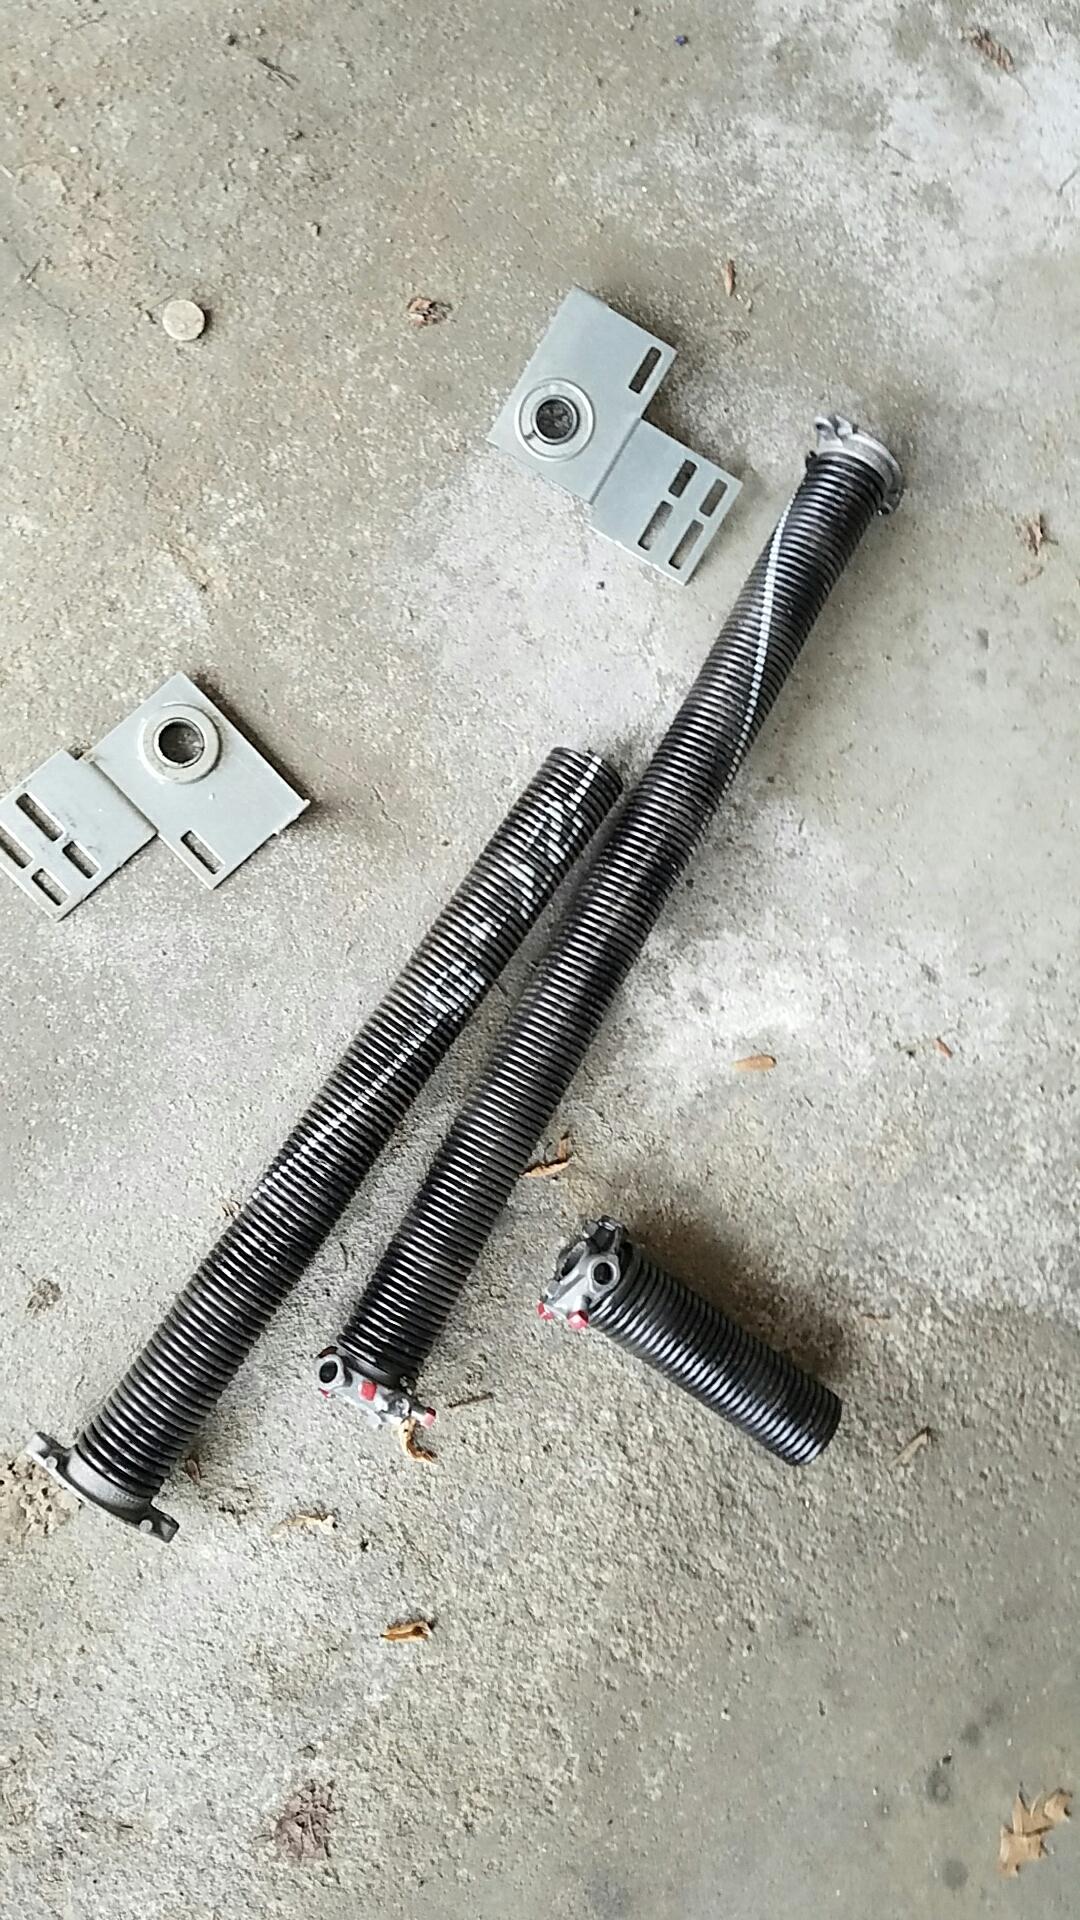 Minnetonka, MN - Replaced garage door Springs and end bearings